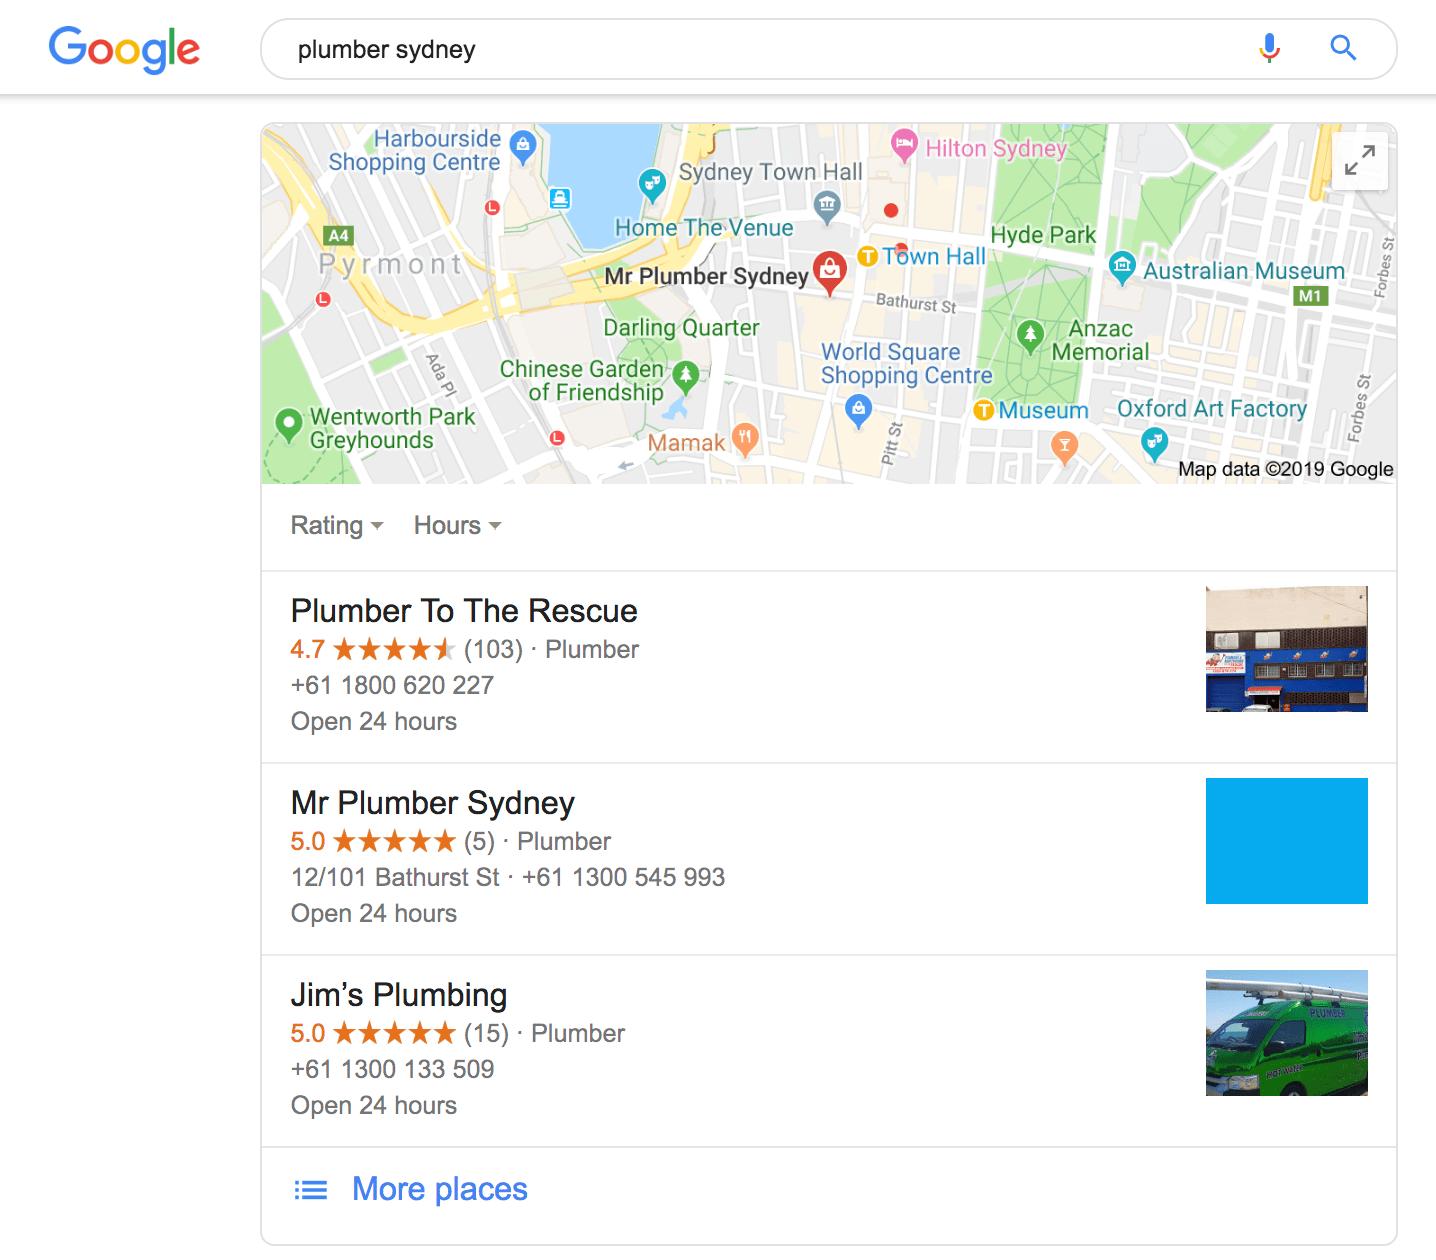 google my business listing sydney